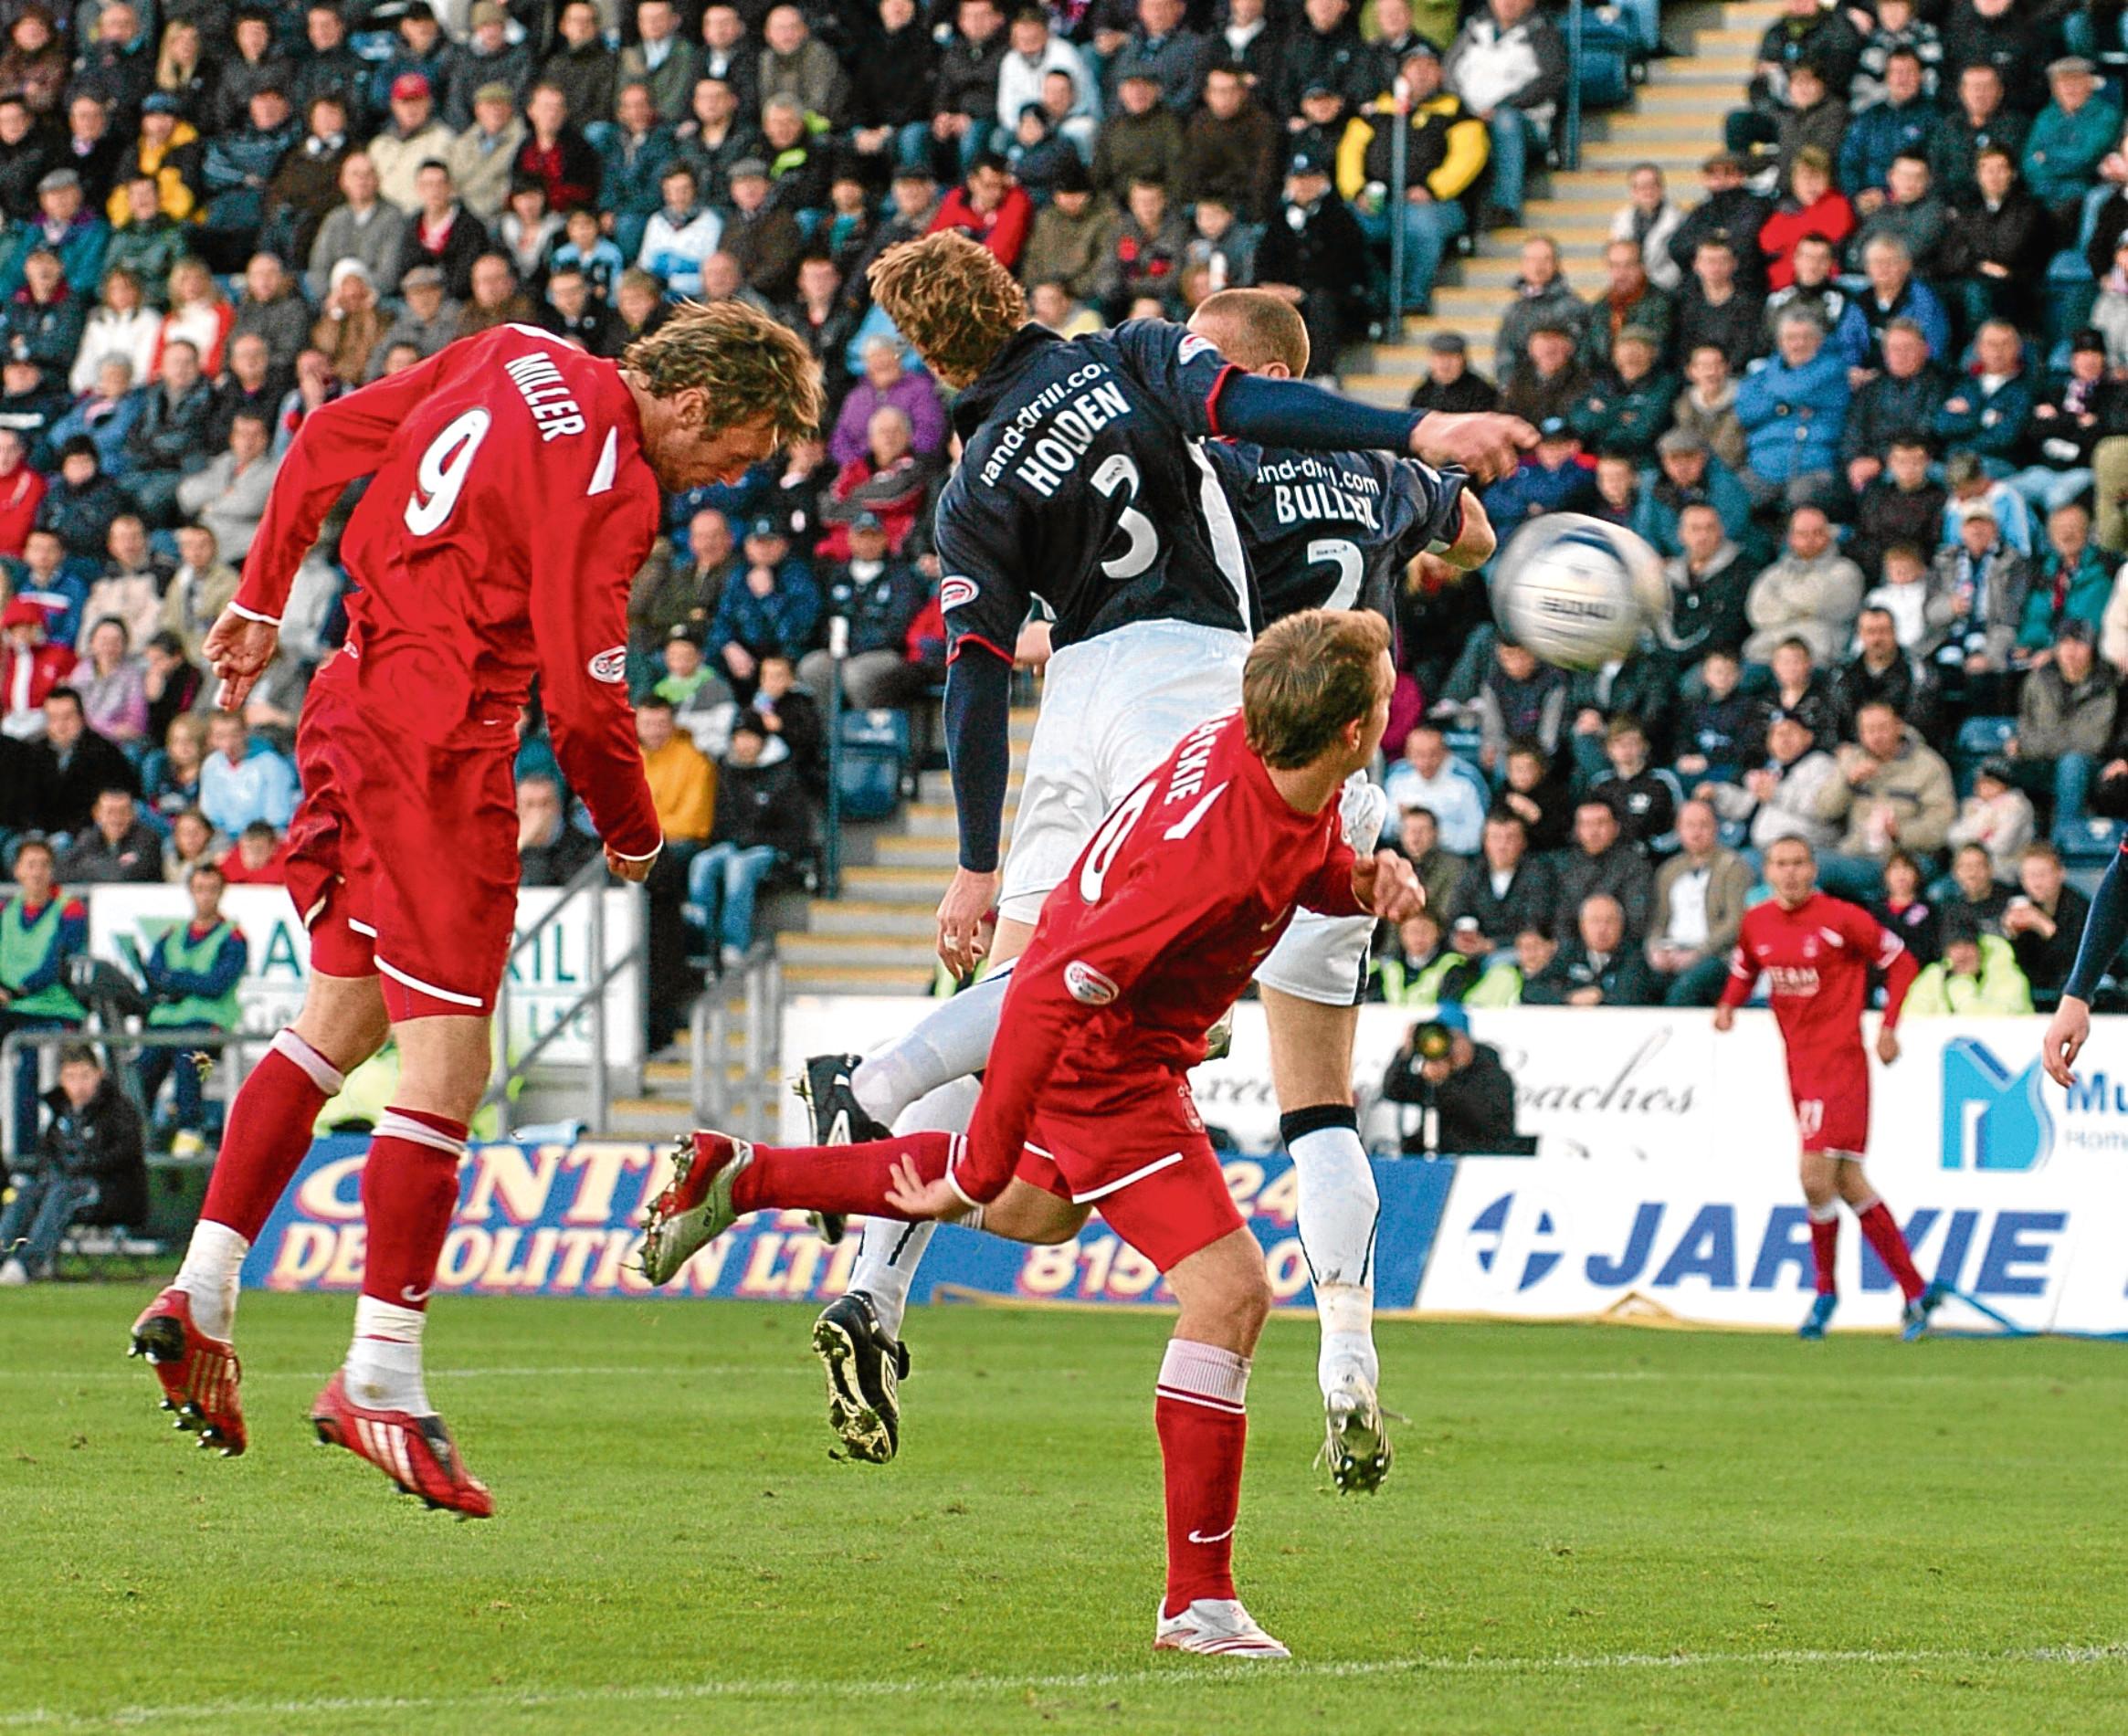 Lee Miller scores his goal during  the match at Falkirk Stadium, Falkirk.